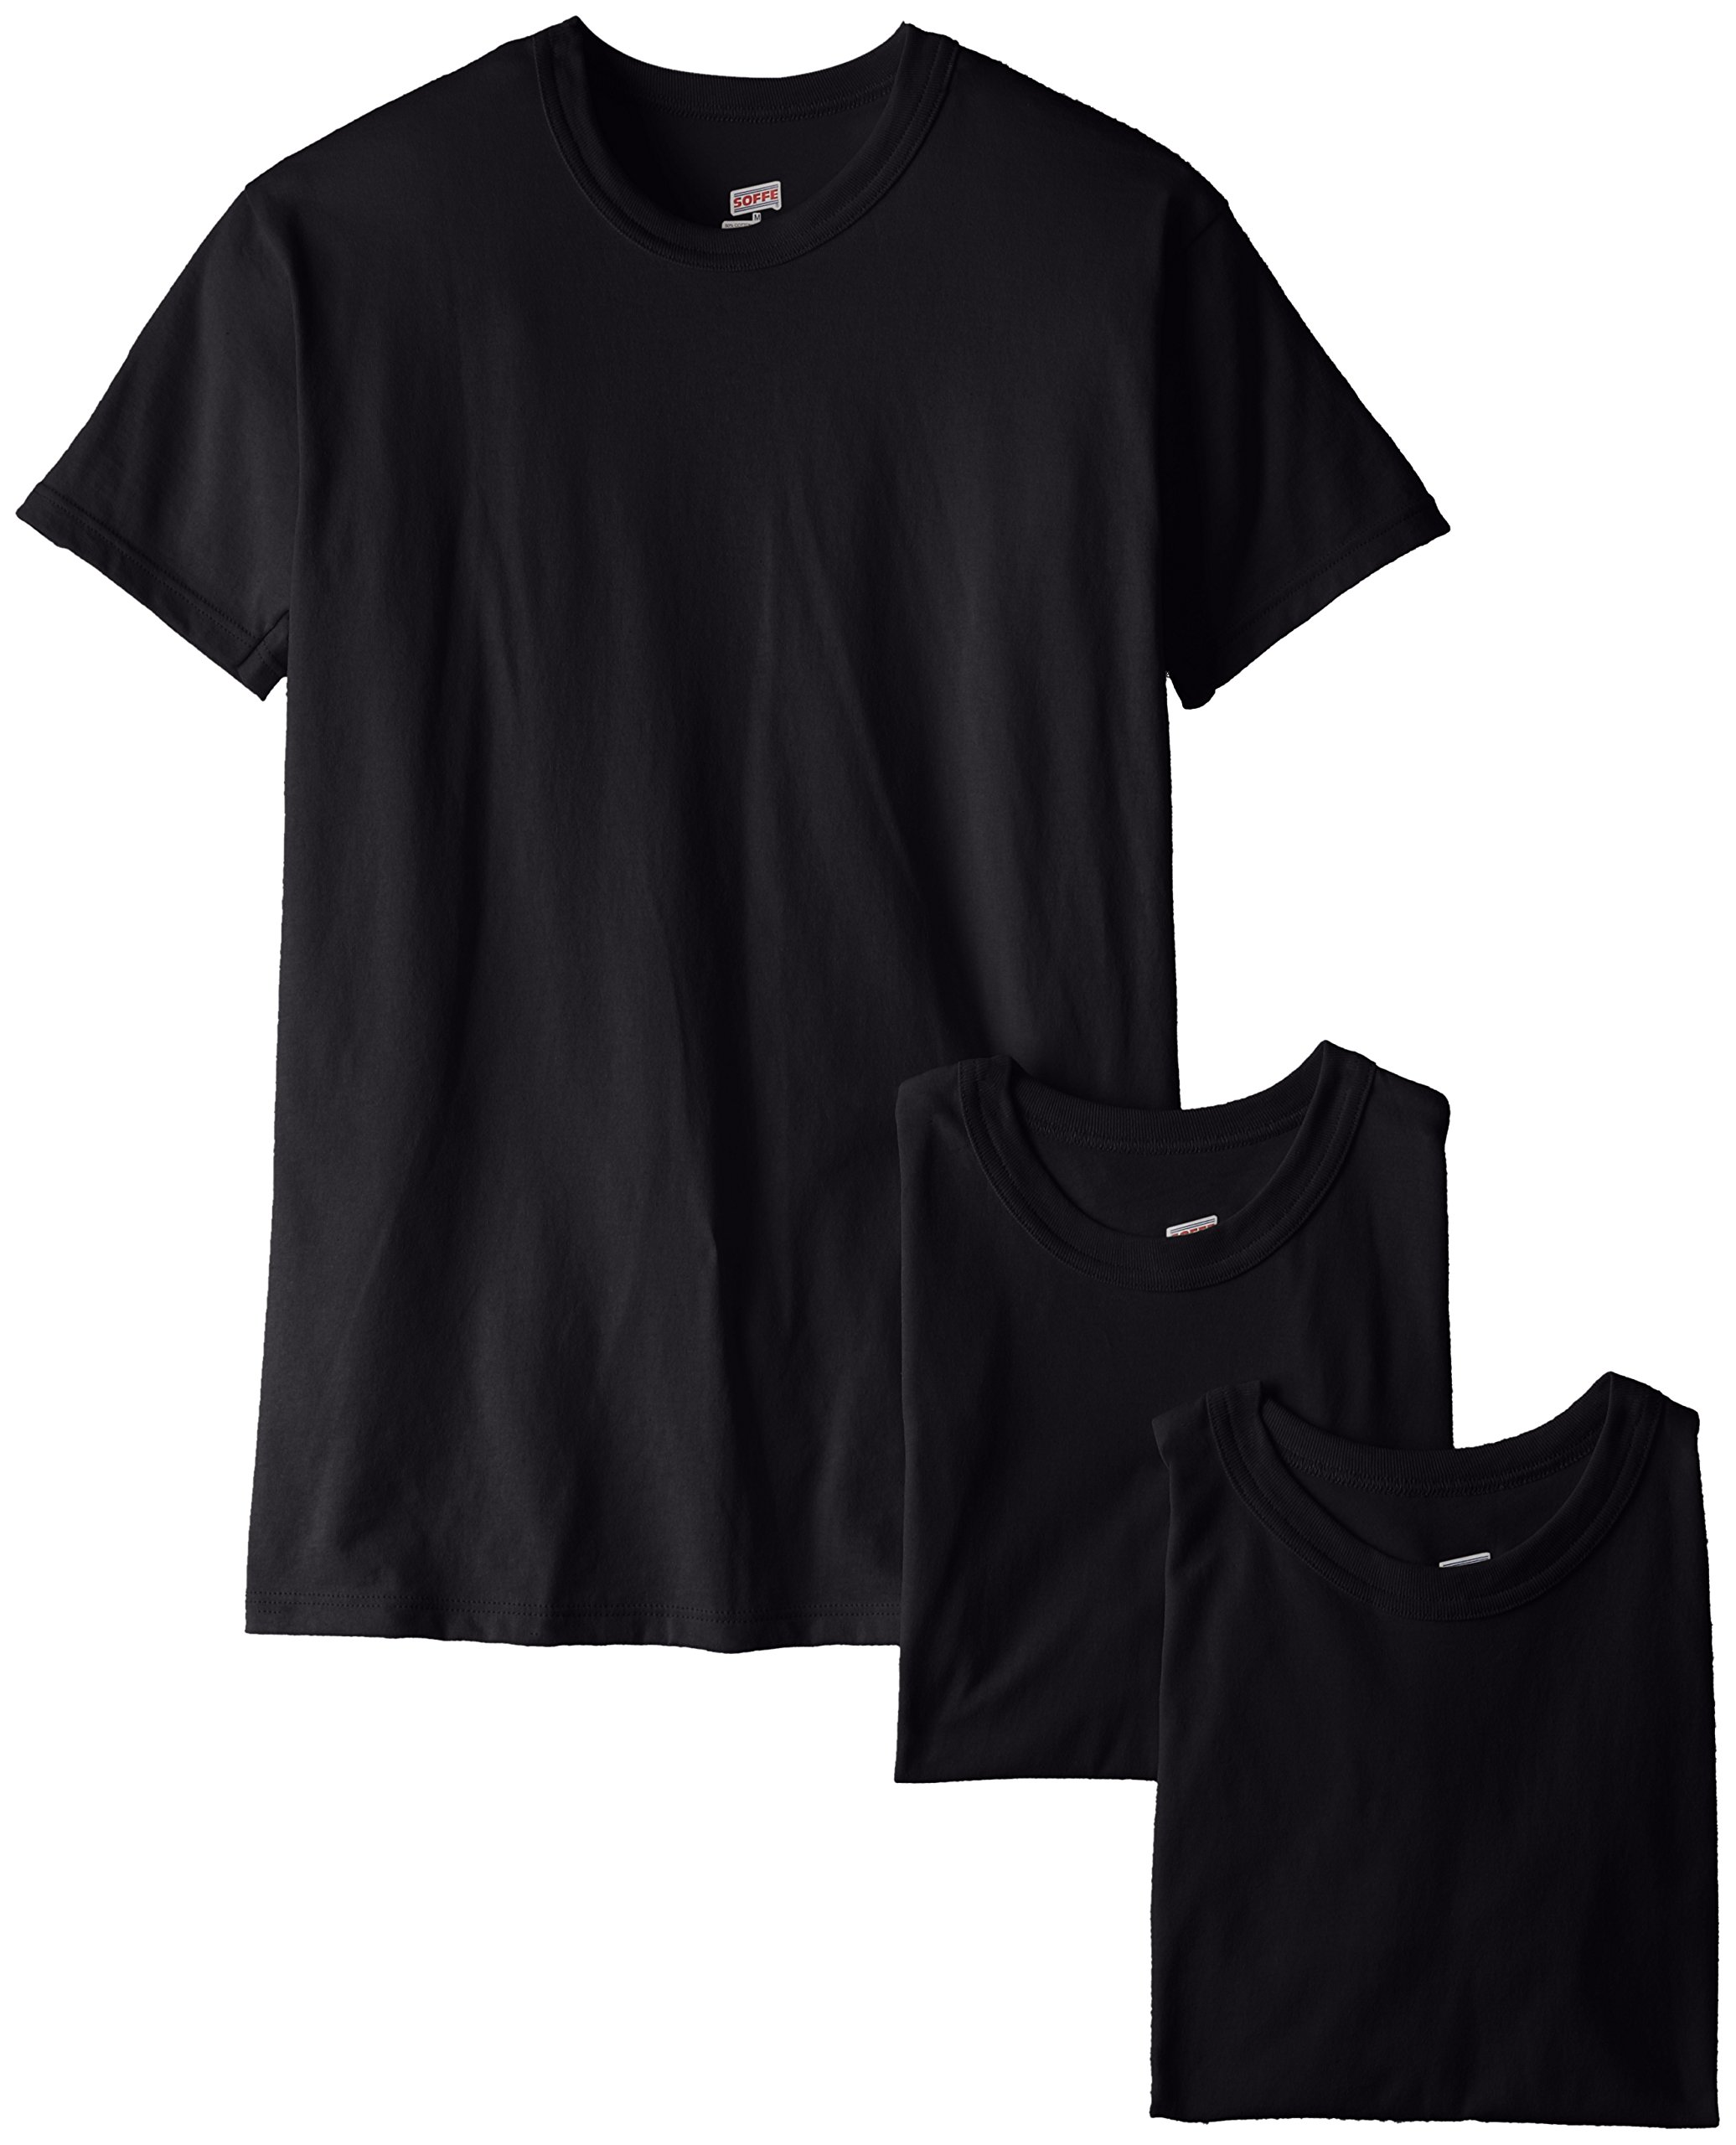 Soffe Men's 3-Pack Short Sleeve Crew Neck Military T-Shirt, Black, Small